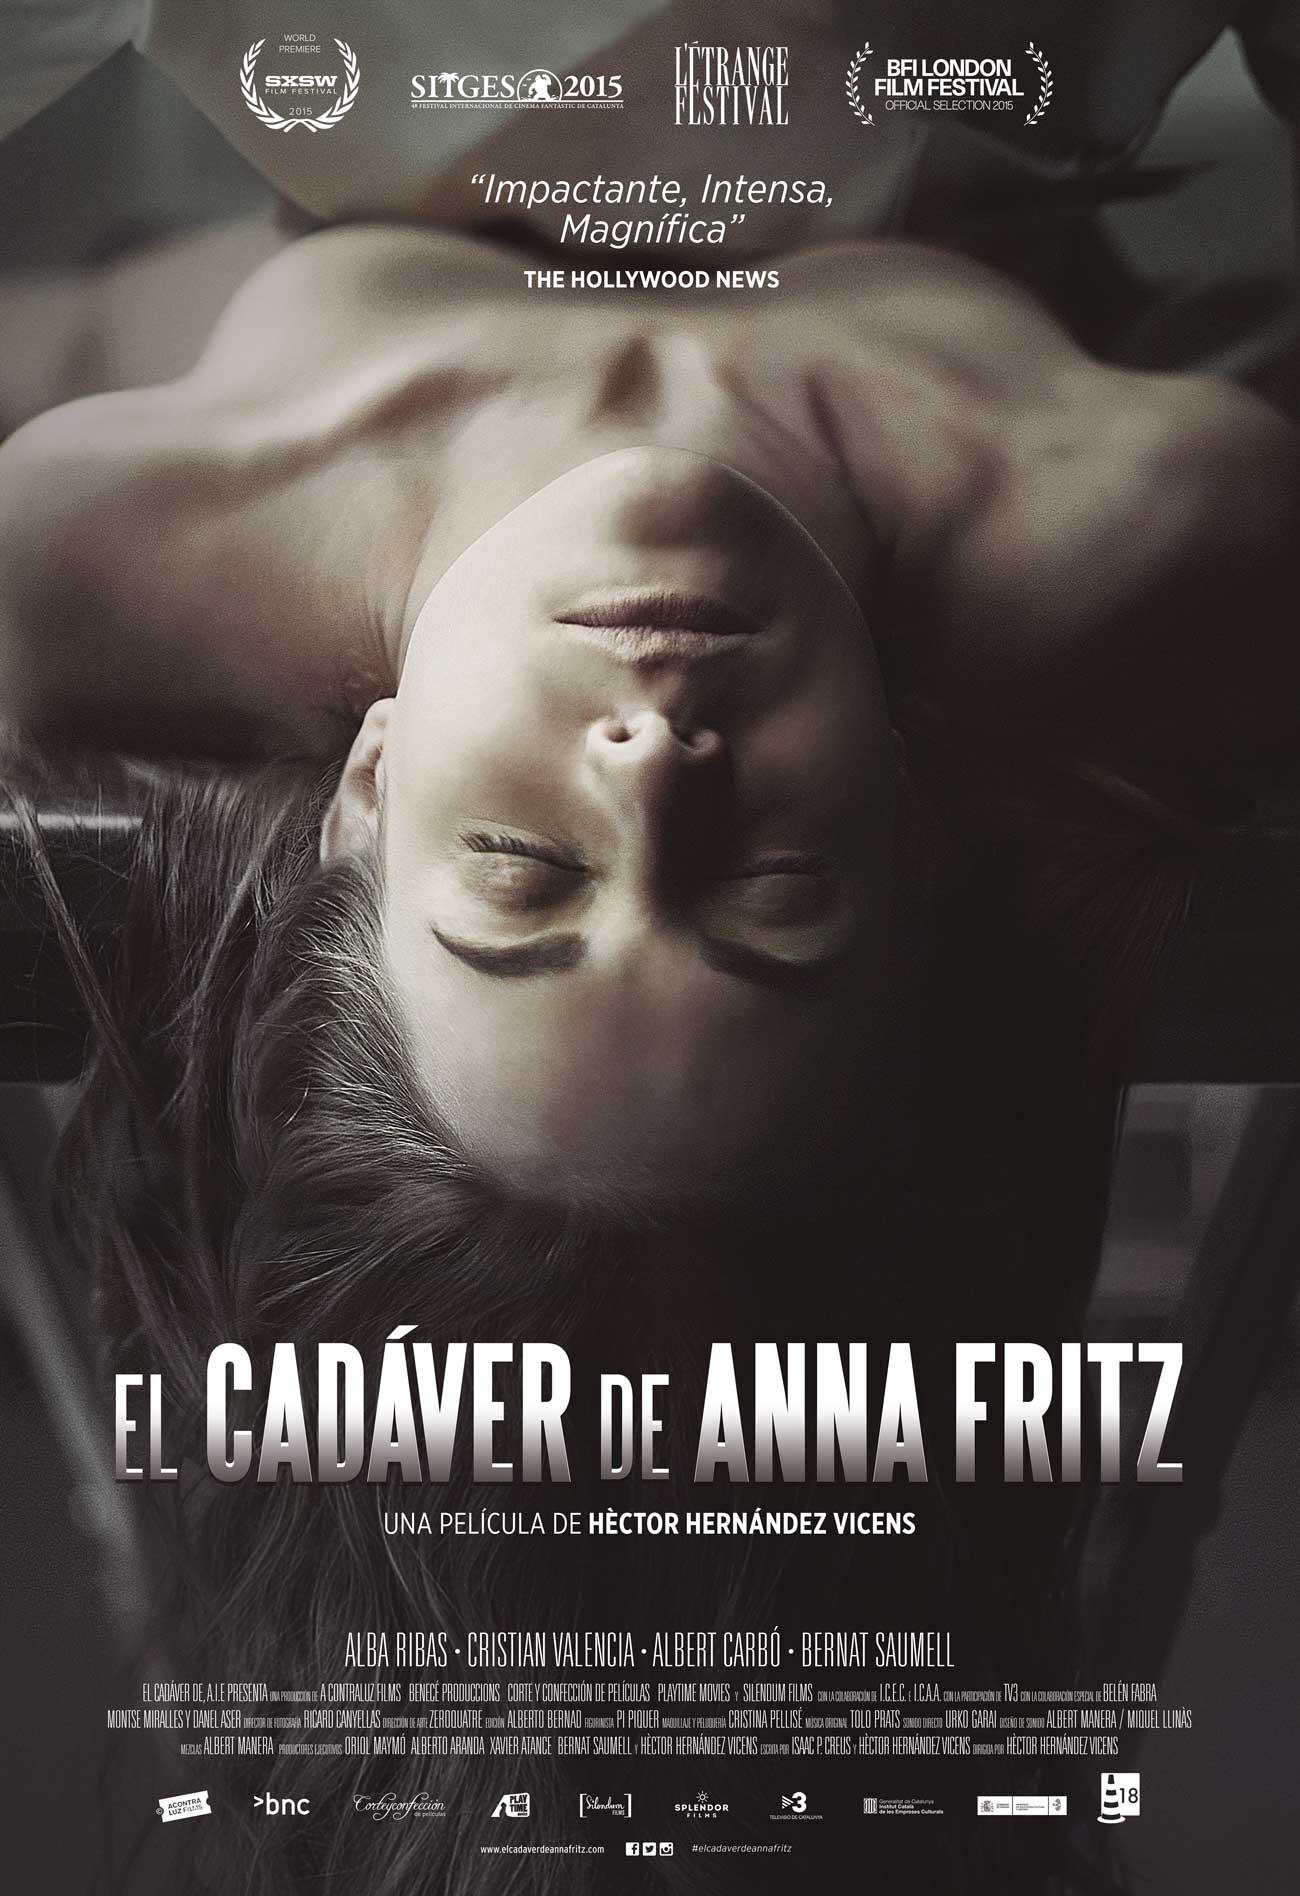 فيلم The Corpse Of Anna Fritz 2015 مترجم للكبار فقط